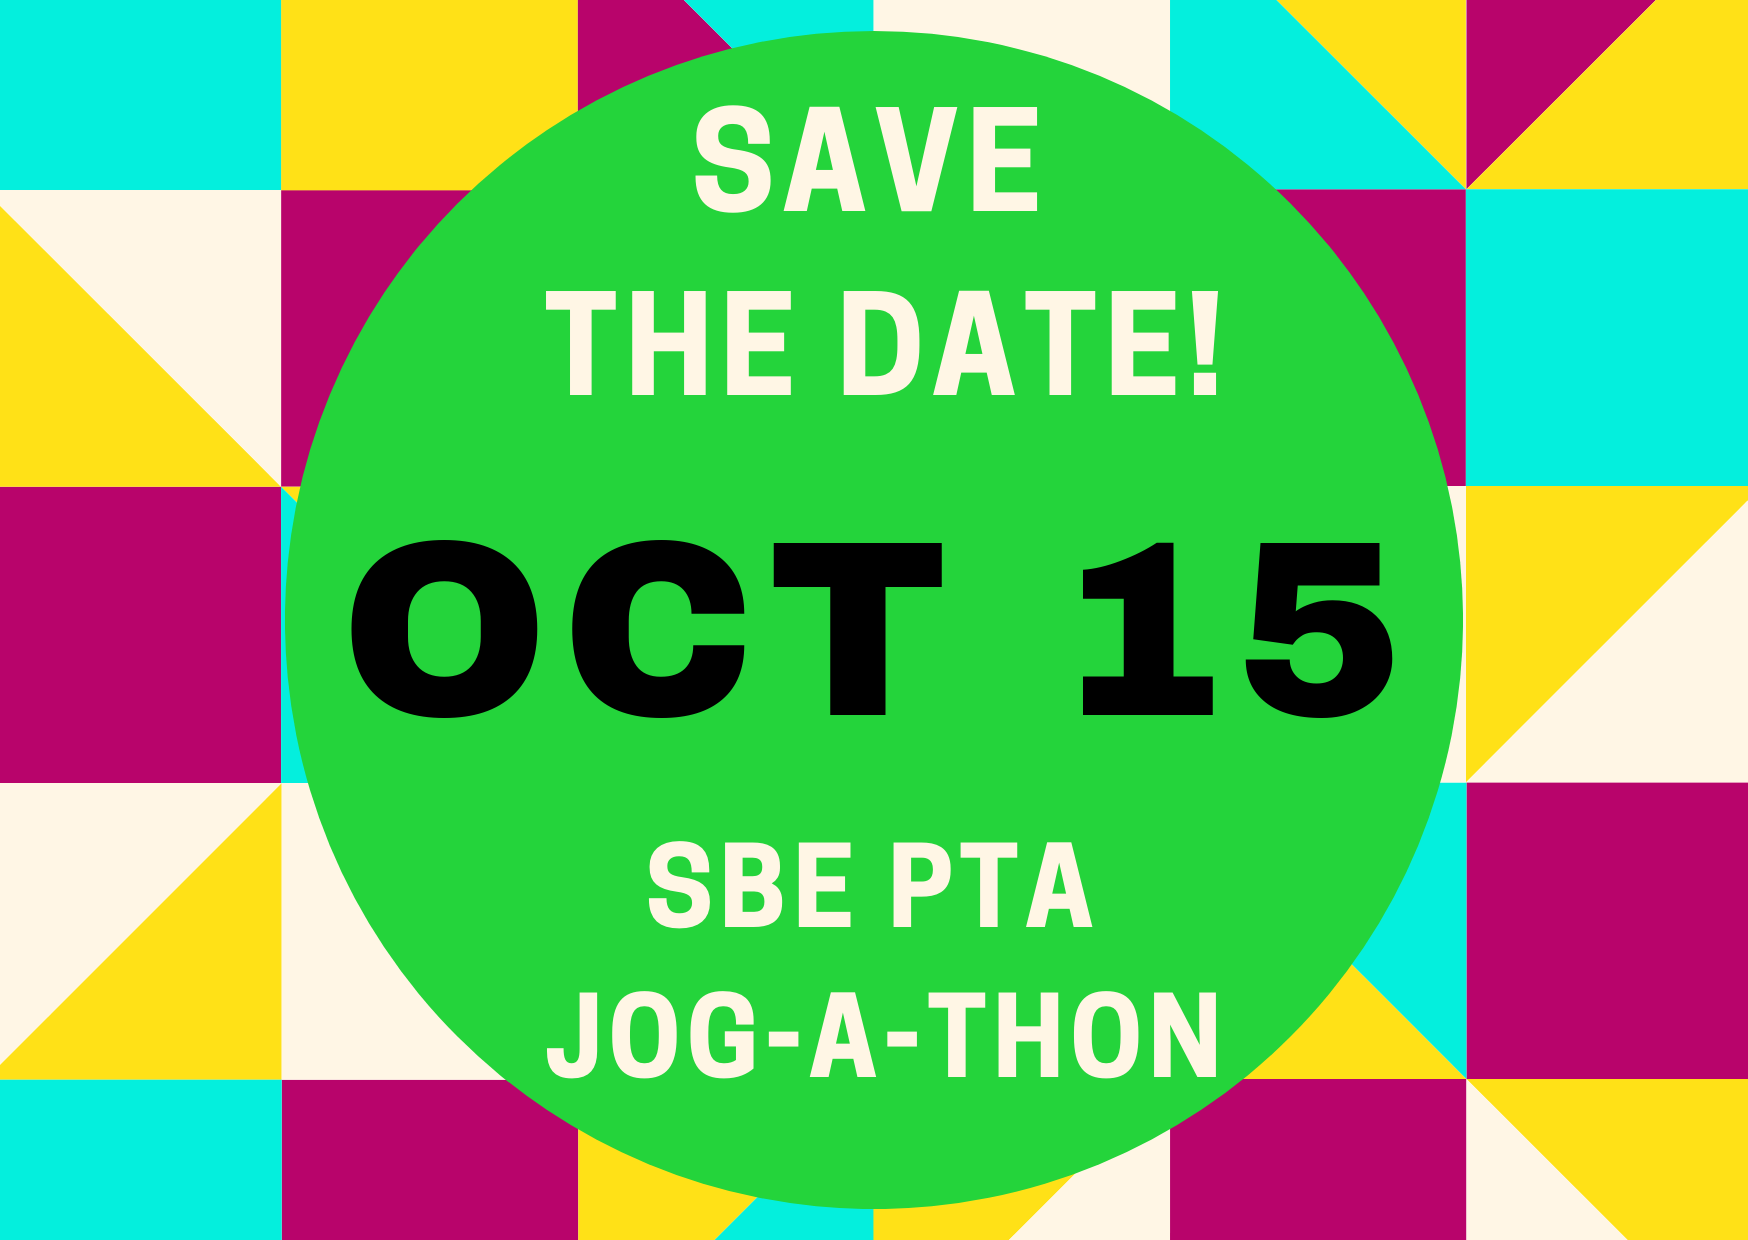 2021 SBE PTA BRIGHT JOG-A-THON